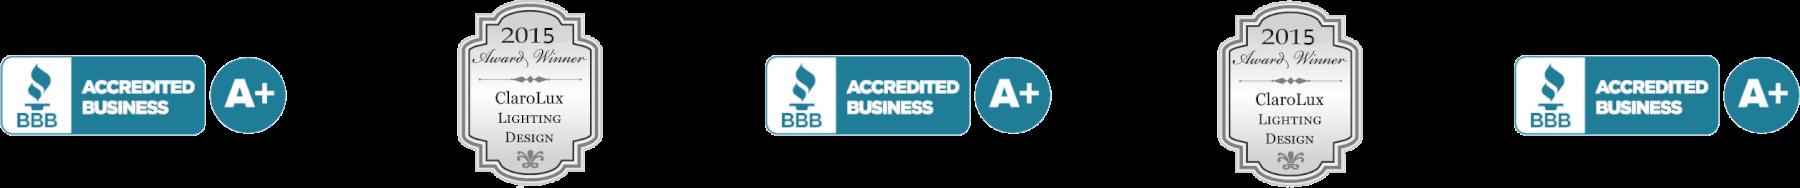 BBB Accredited - Clarolux Lighting Design Award